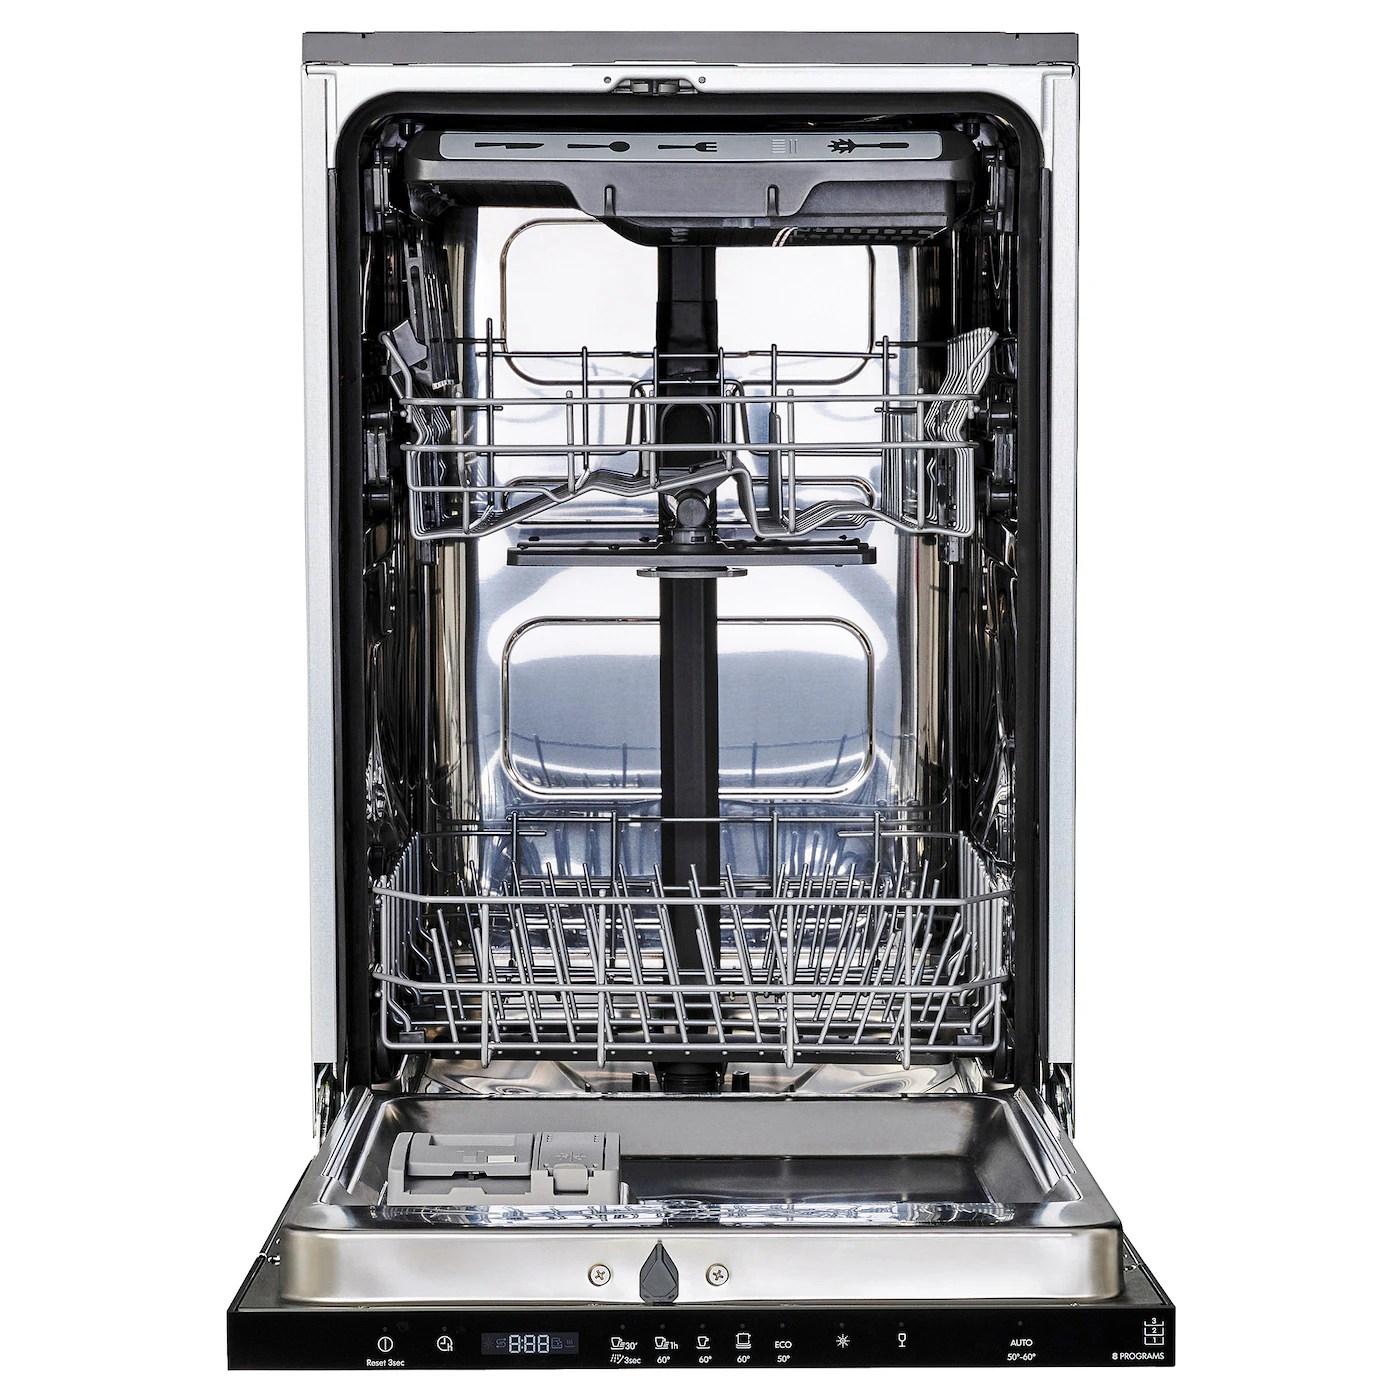 Medelstor Lave Vaisselle Encastrable Ikea 500 45 Cm Ikea